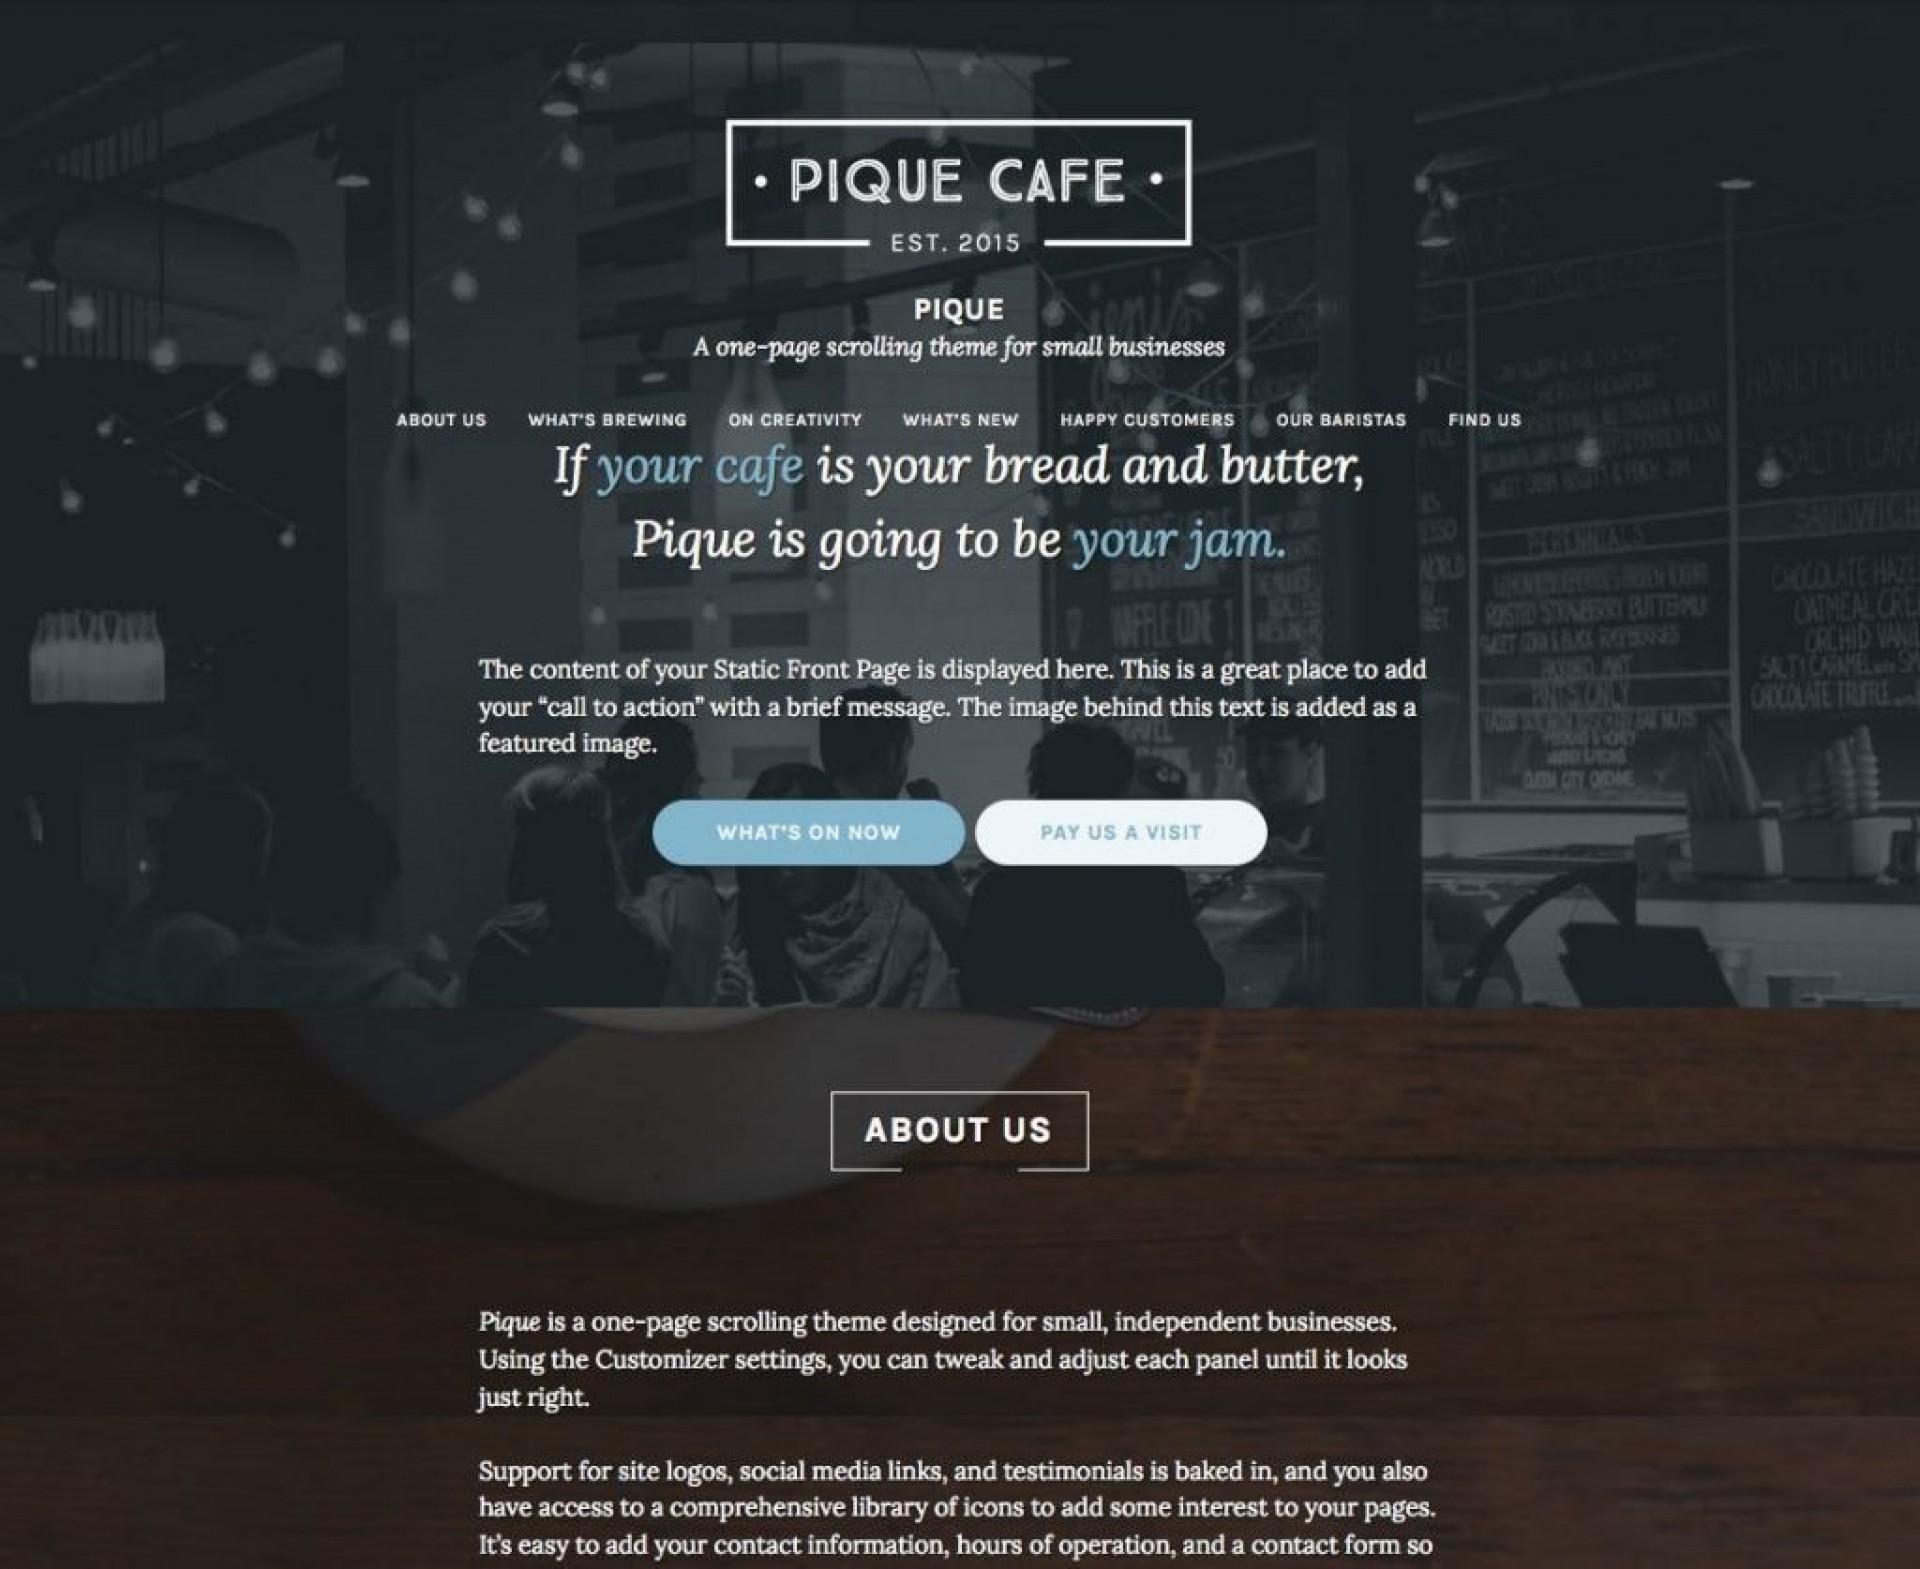 007 Unforgettable One Page Website Template Free Download Wordpres Photo  Wordpress1920